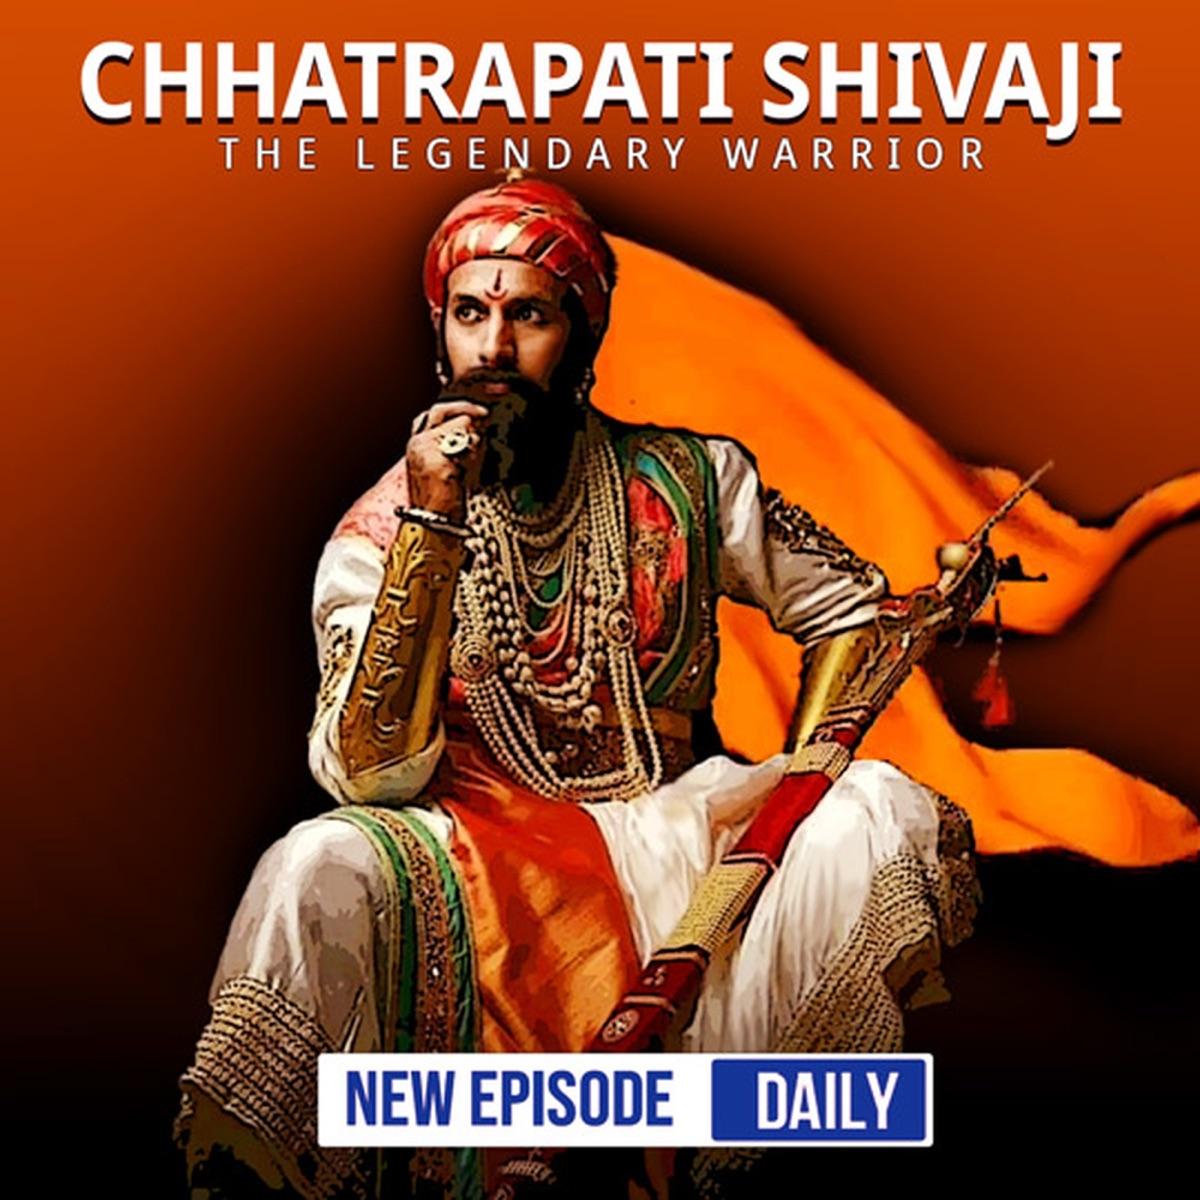 Chhatrapati Shivaji- The Legendary Warrior Season-1 | Author- Rahul H. Joshi